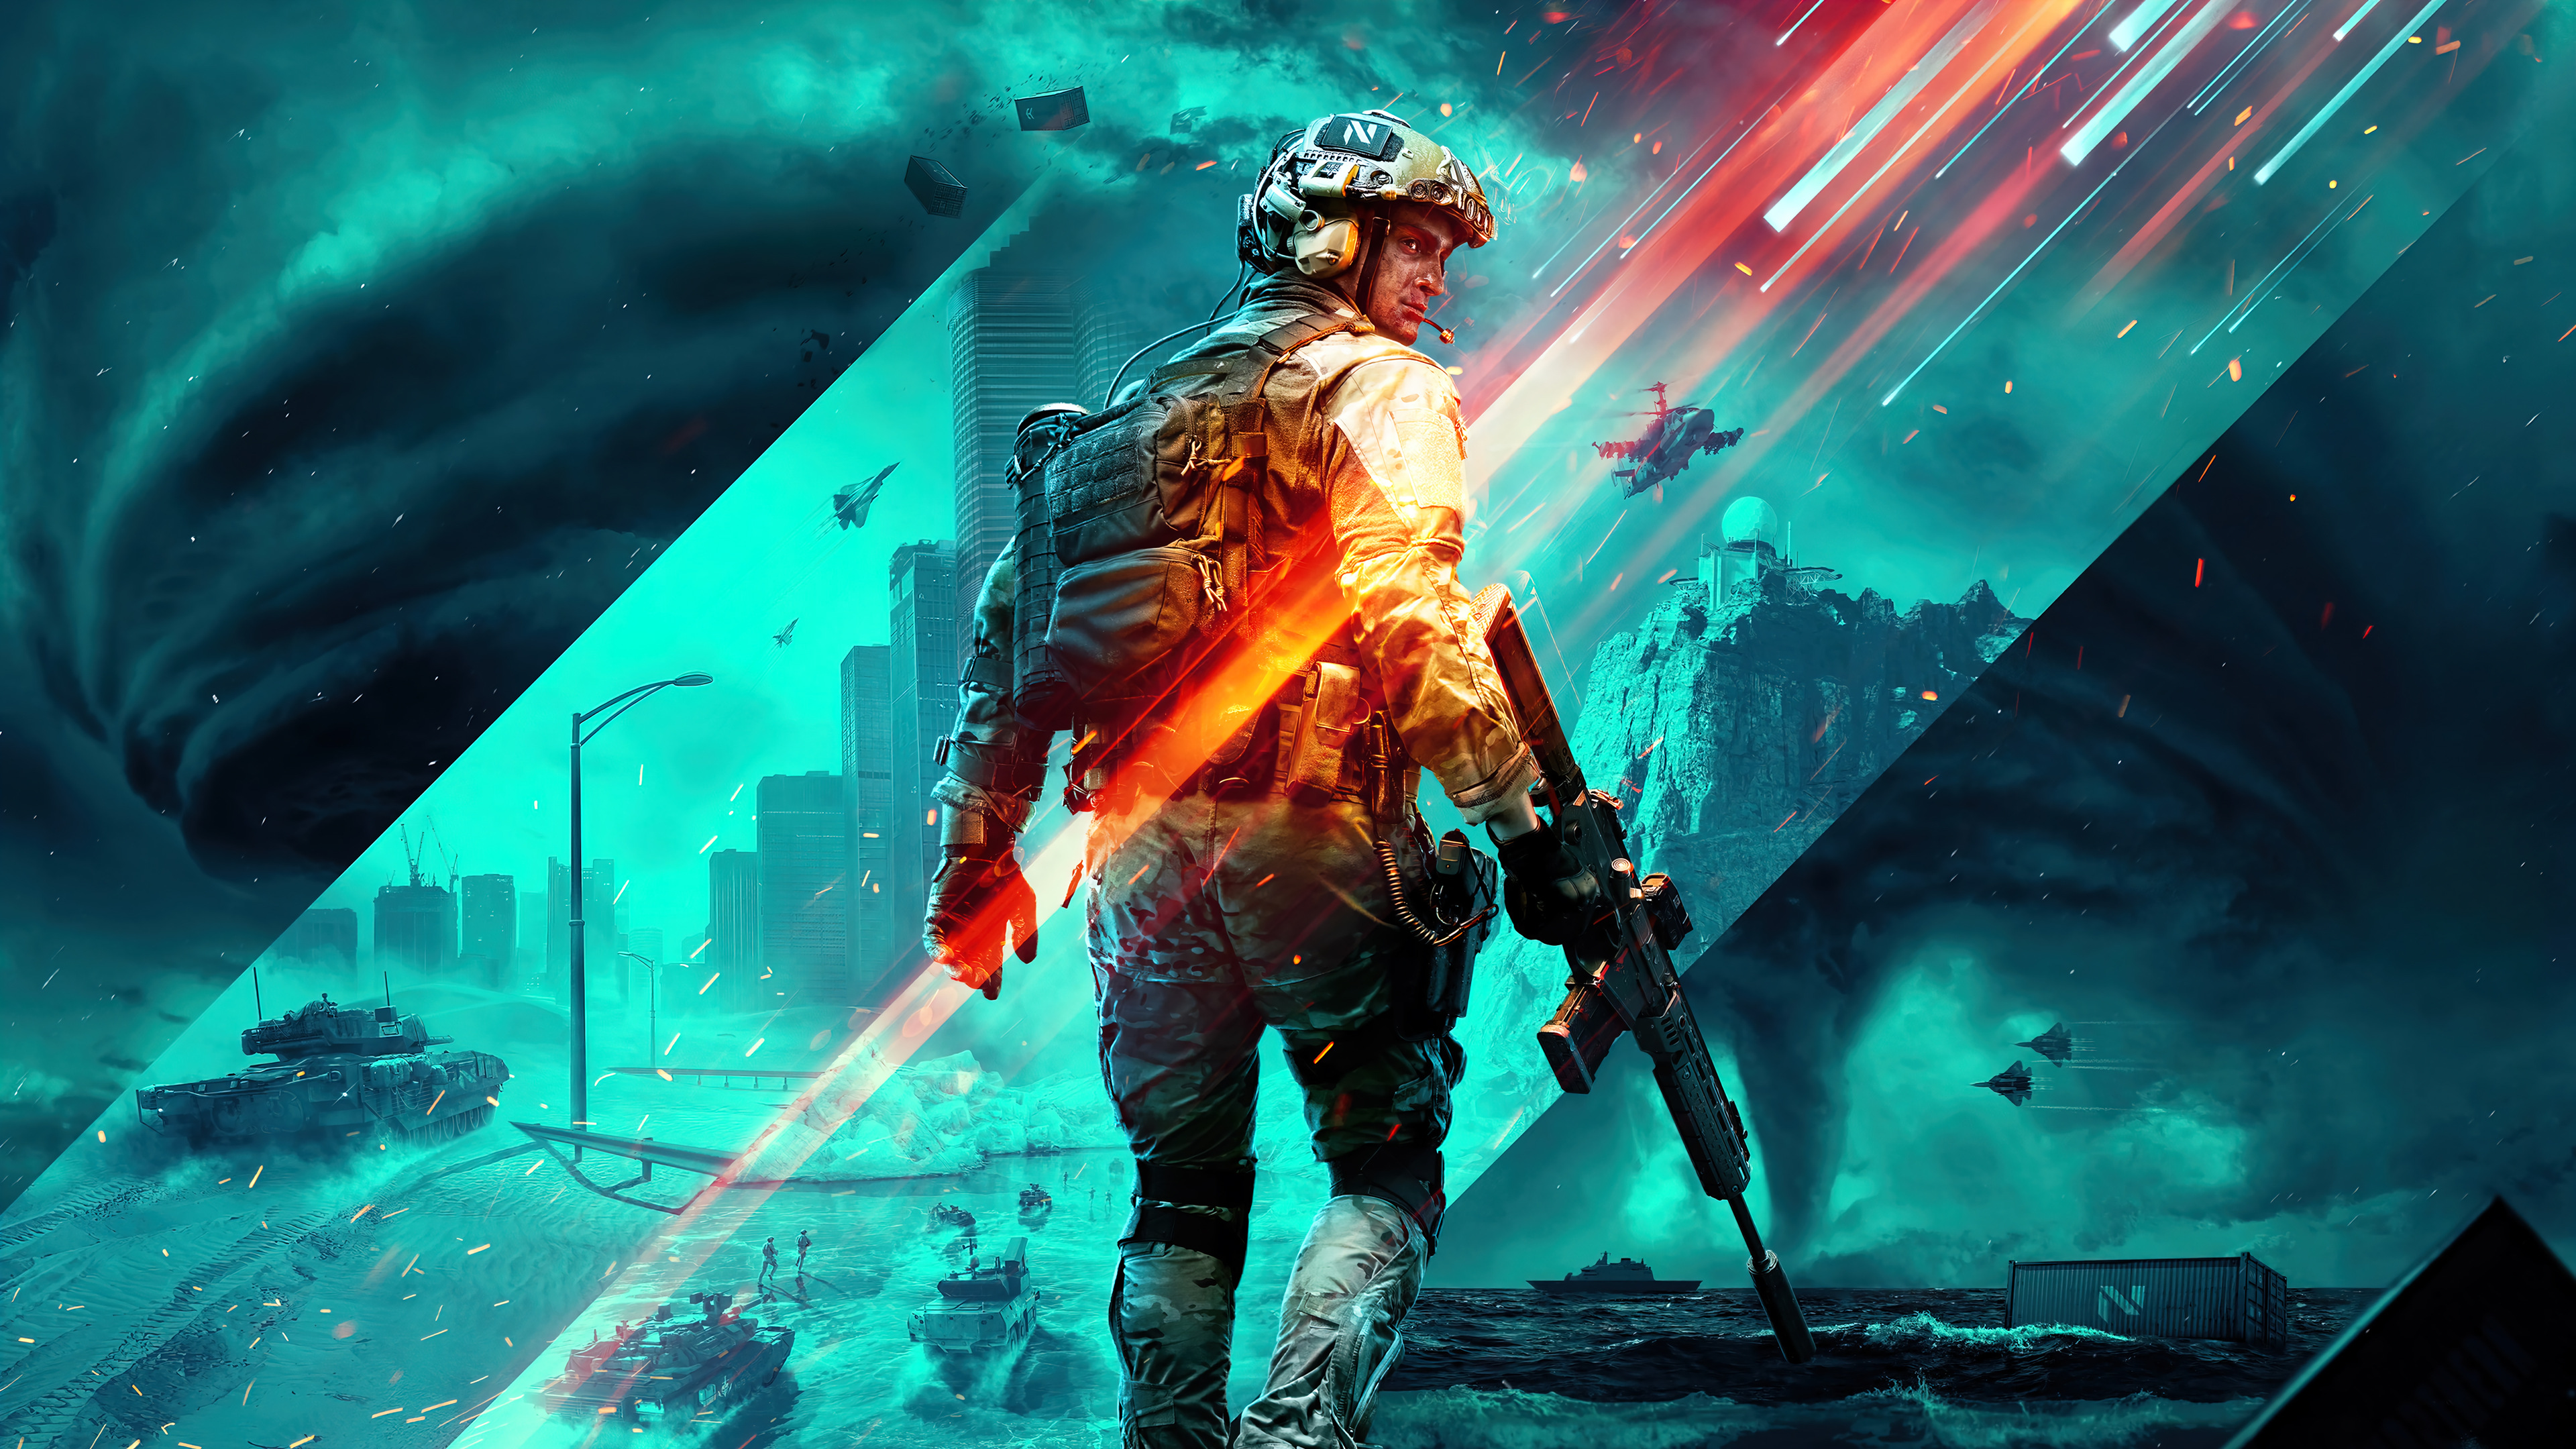 Wallpaper Soldier from Battlefield 2042